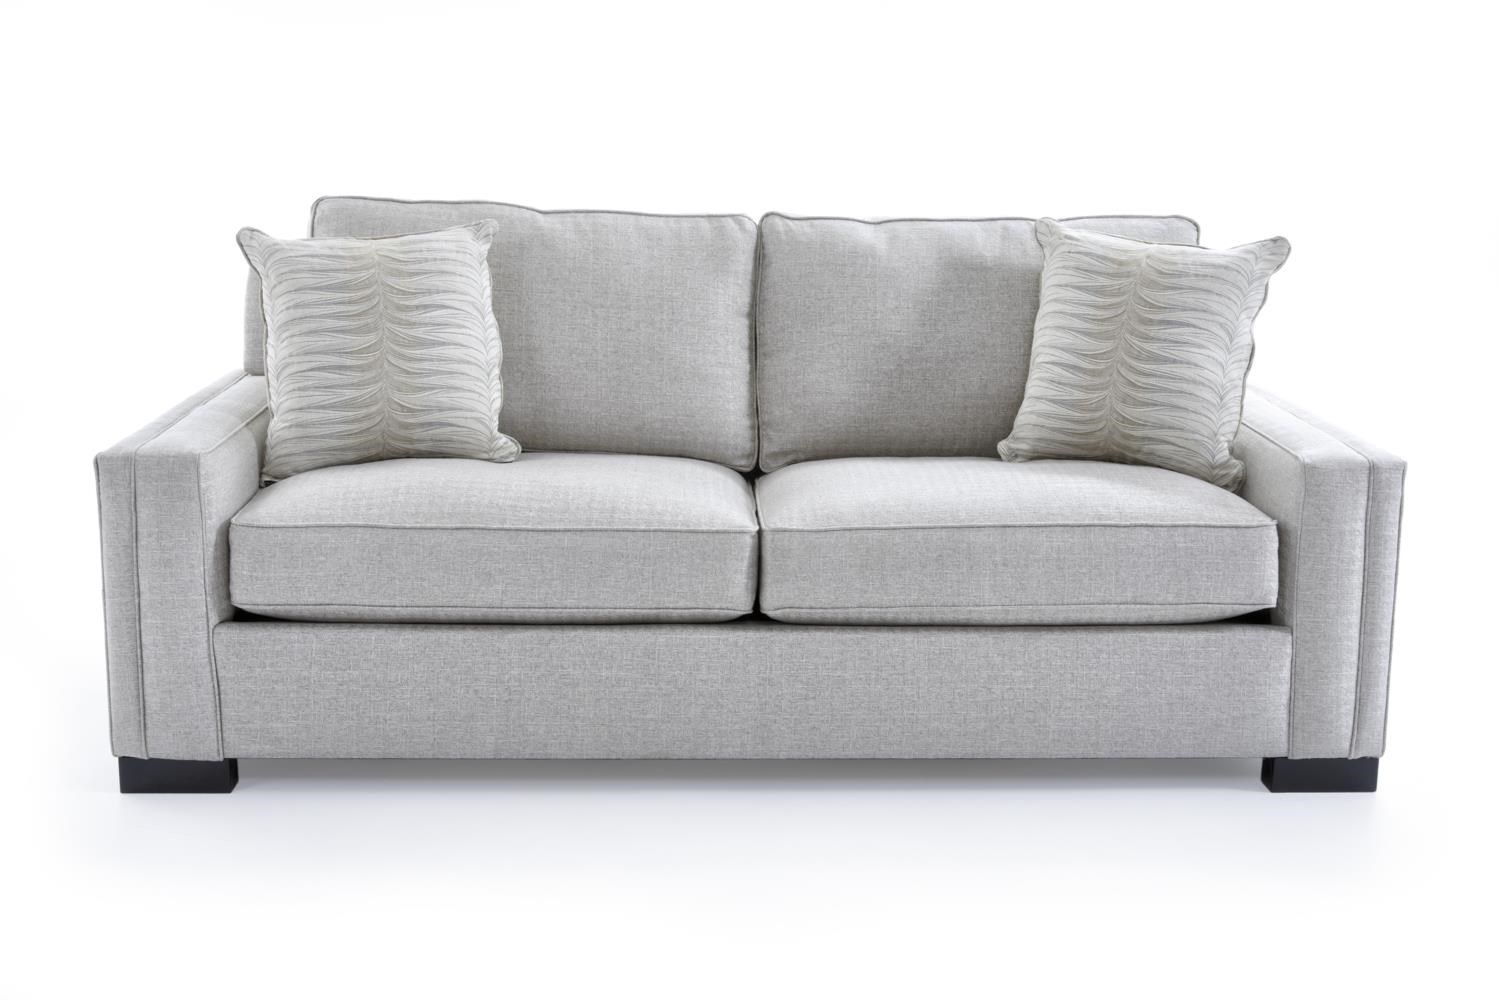 Broyhill Furniture Rocco Apartment Sofa - Item Number: 4280-2 4697-92 CF TP